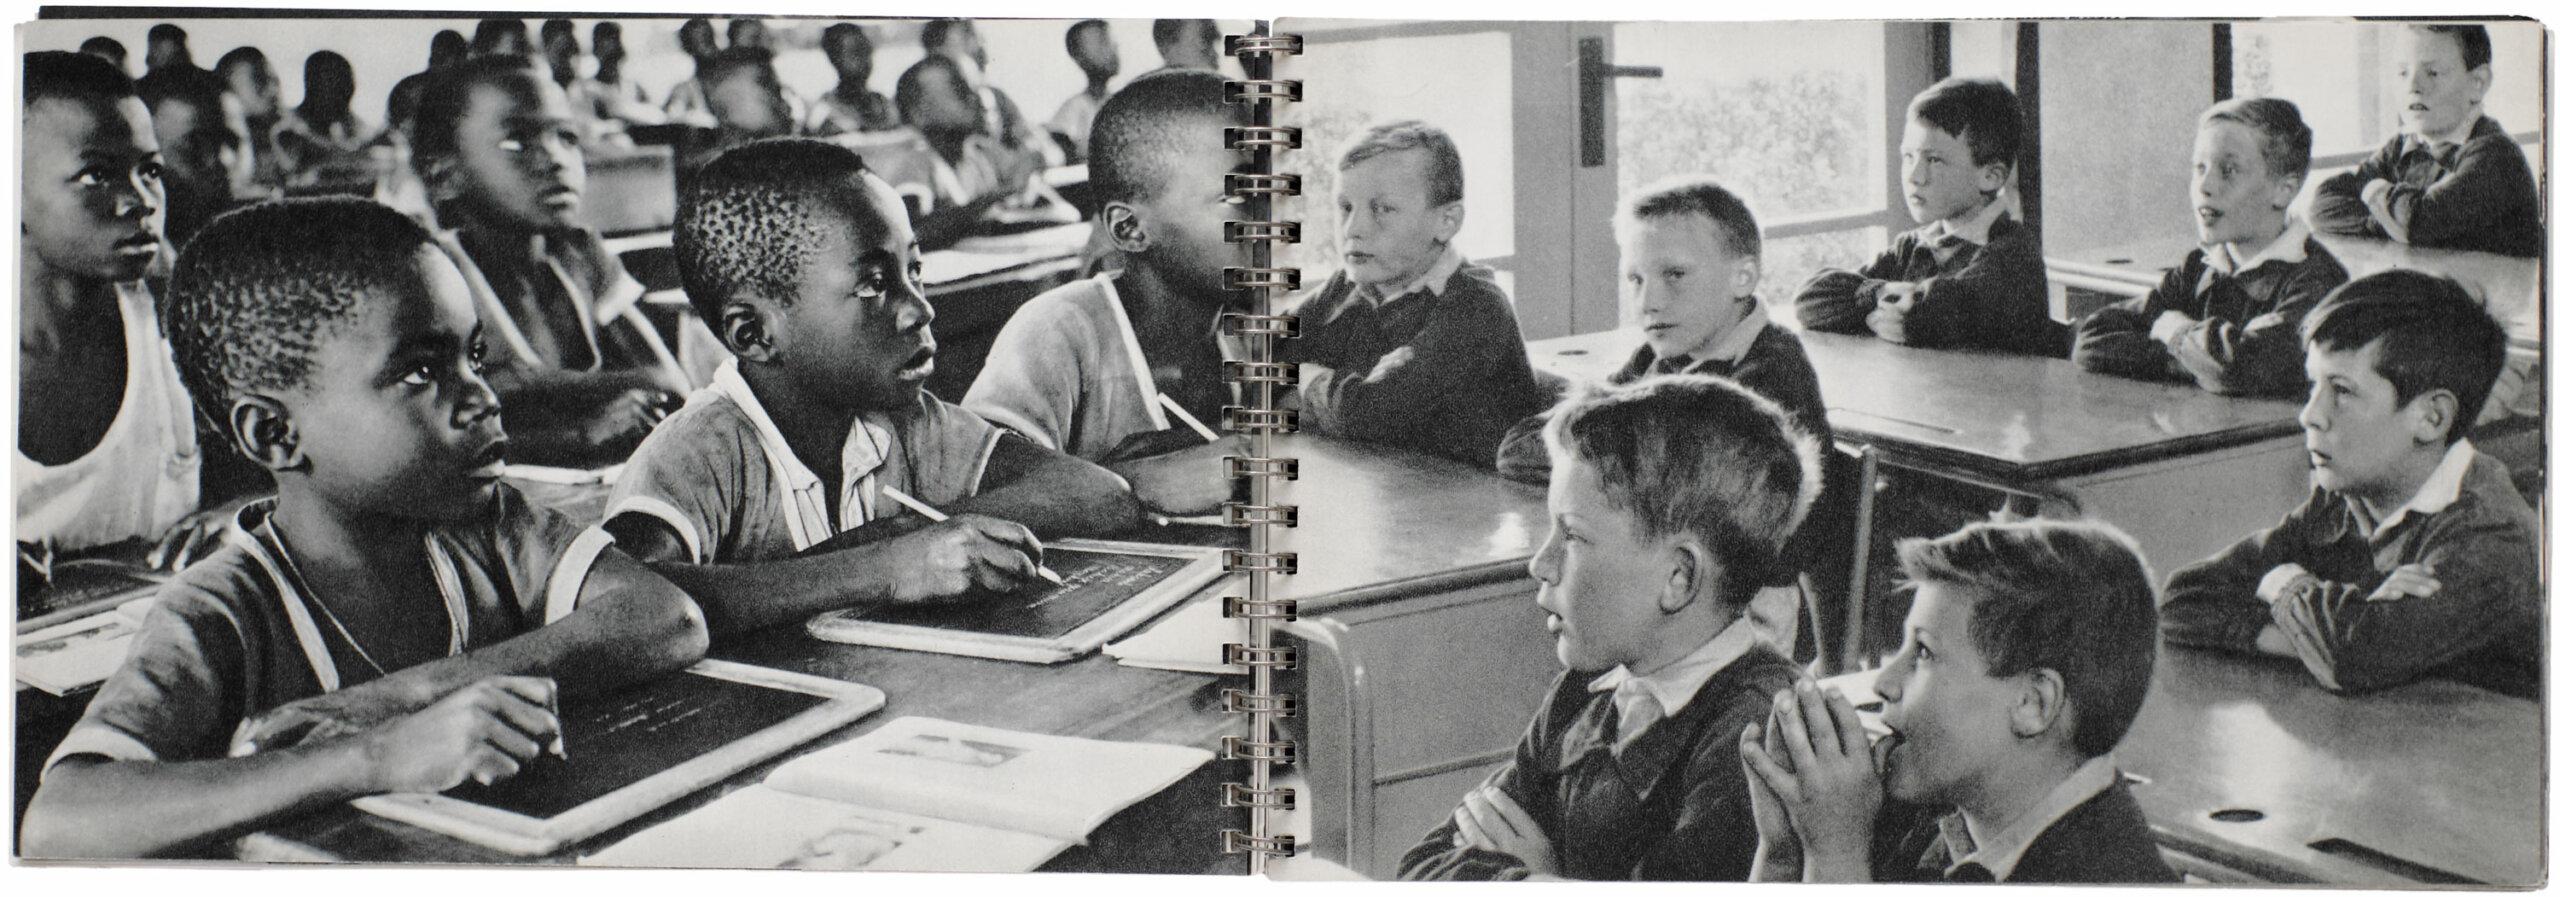 Africainthephotobook-delpire-familyalbum1